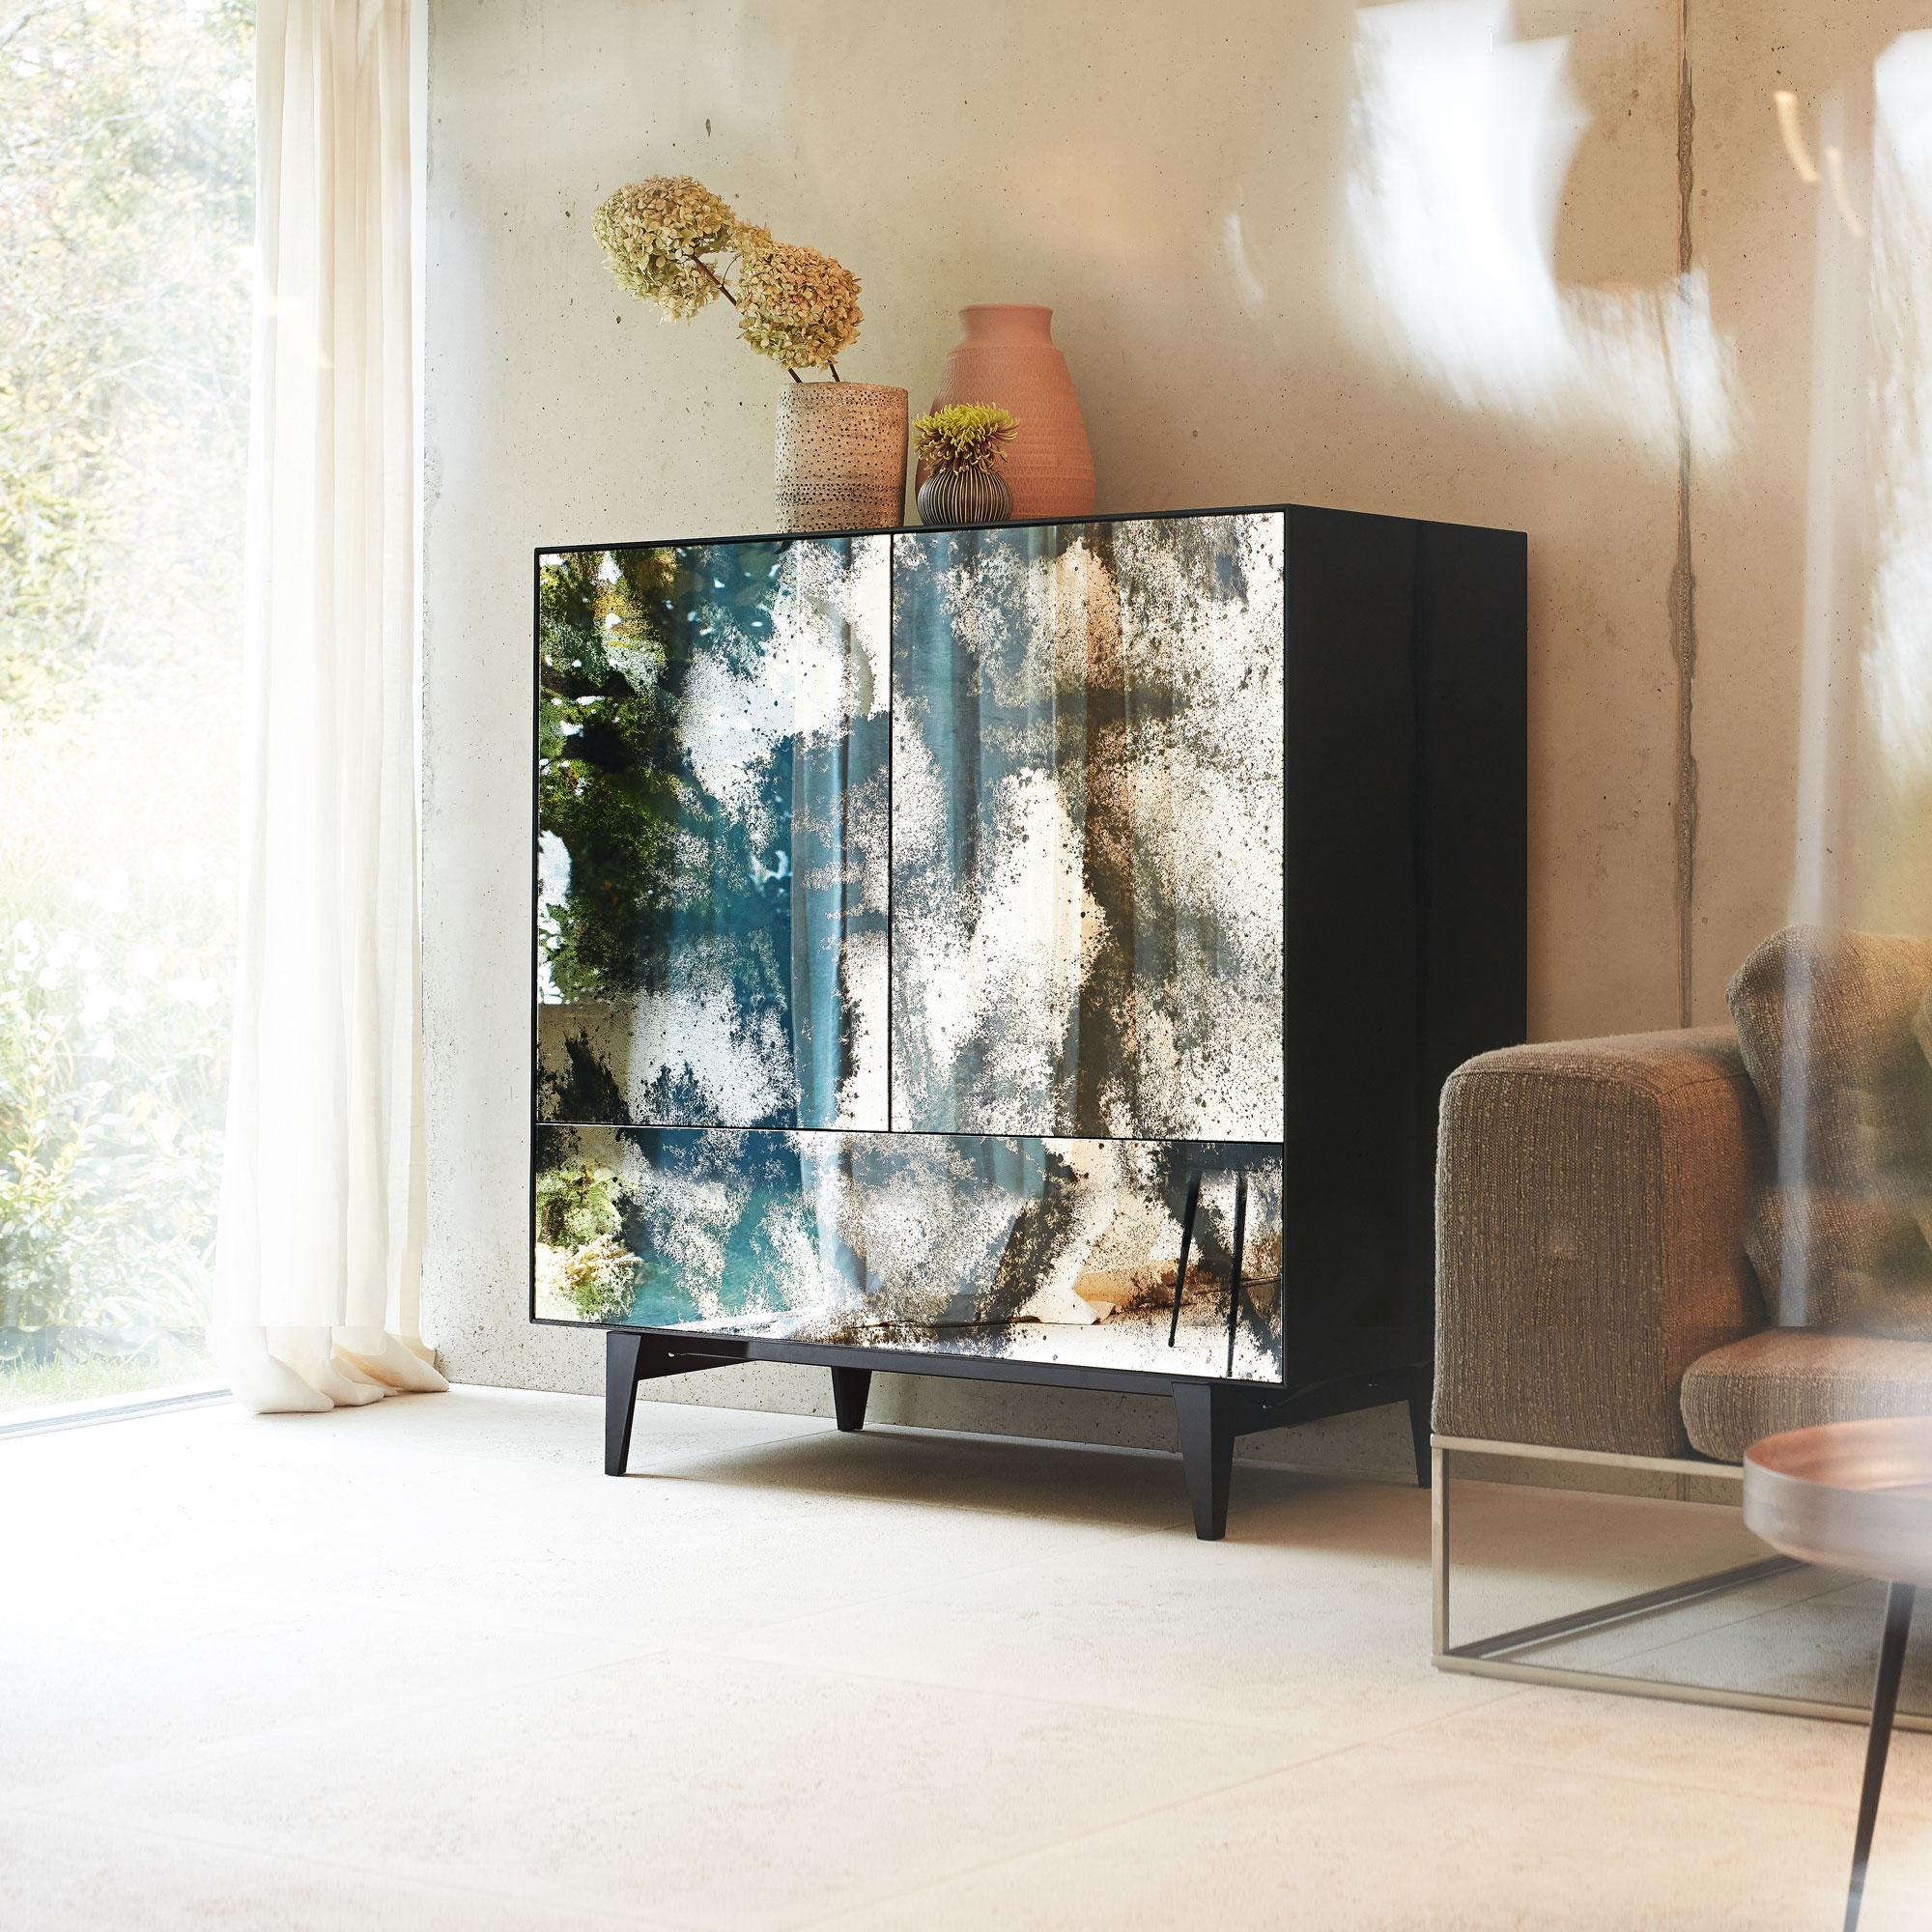 Piure Nex Glamour Moon Sideboard 110 5x48x109 3cm Ambientedirect